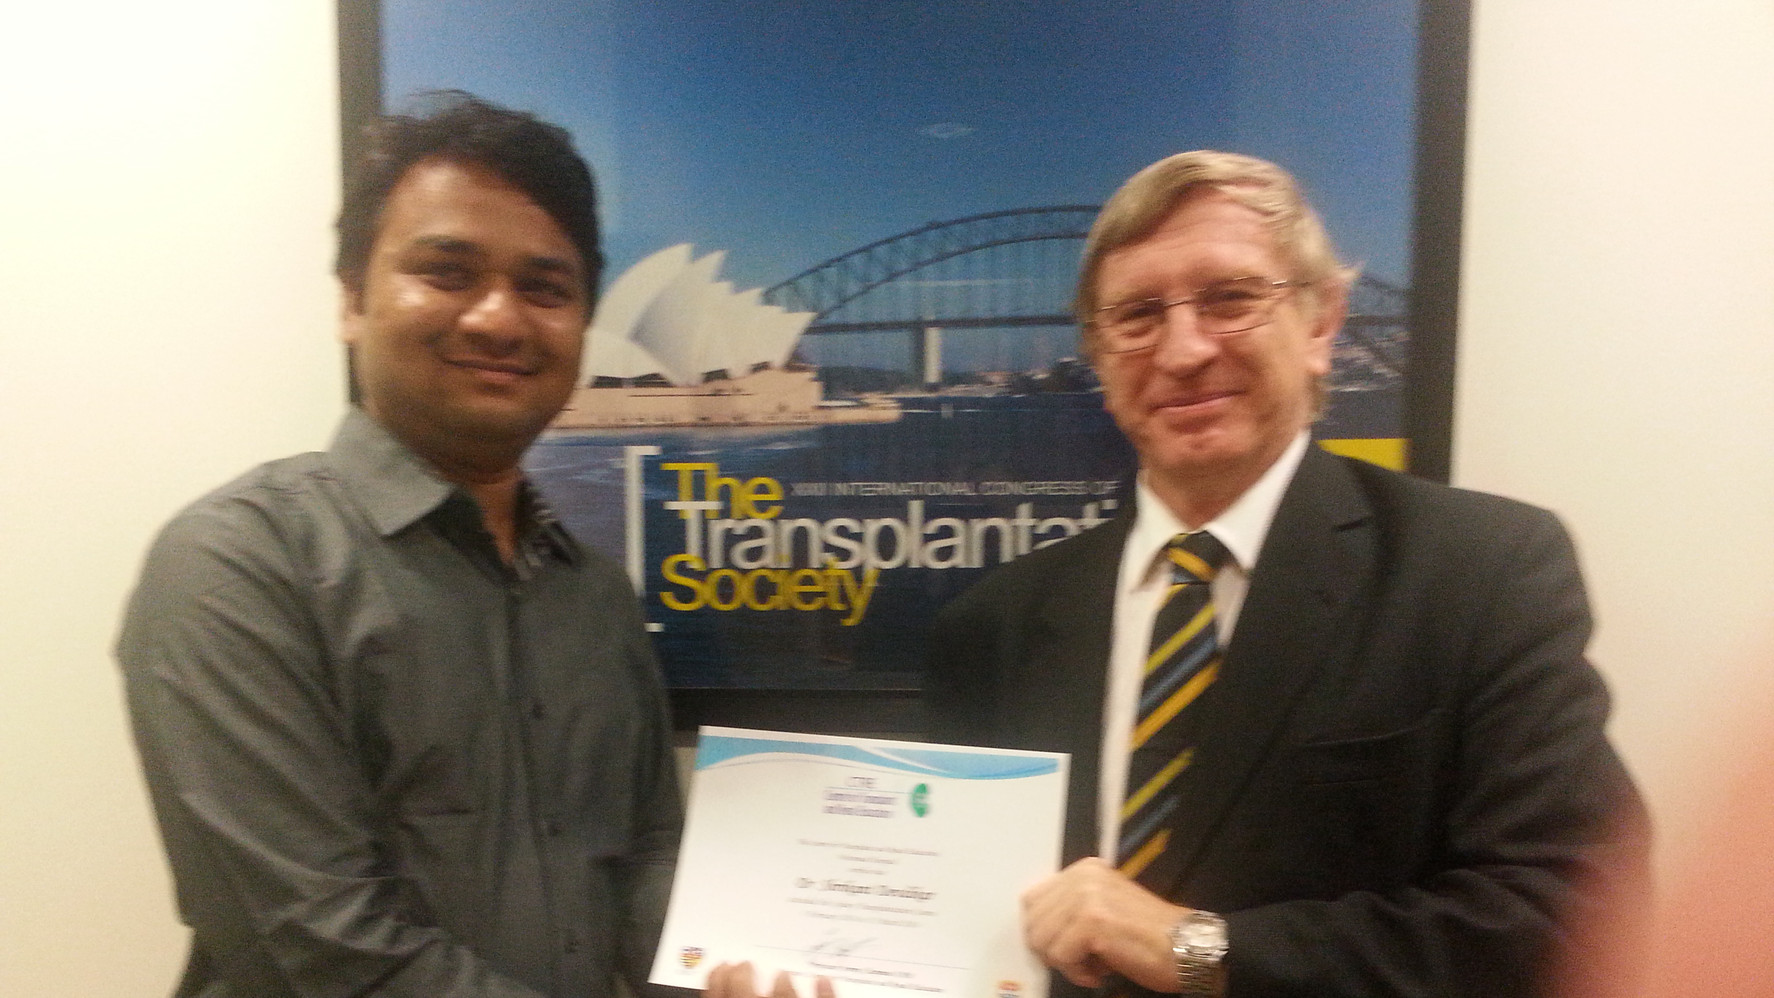 with Prof. J Chapman (Australia) Head of International Society of Nephrology